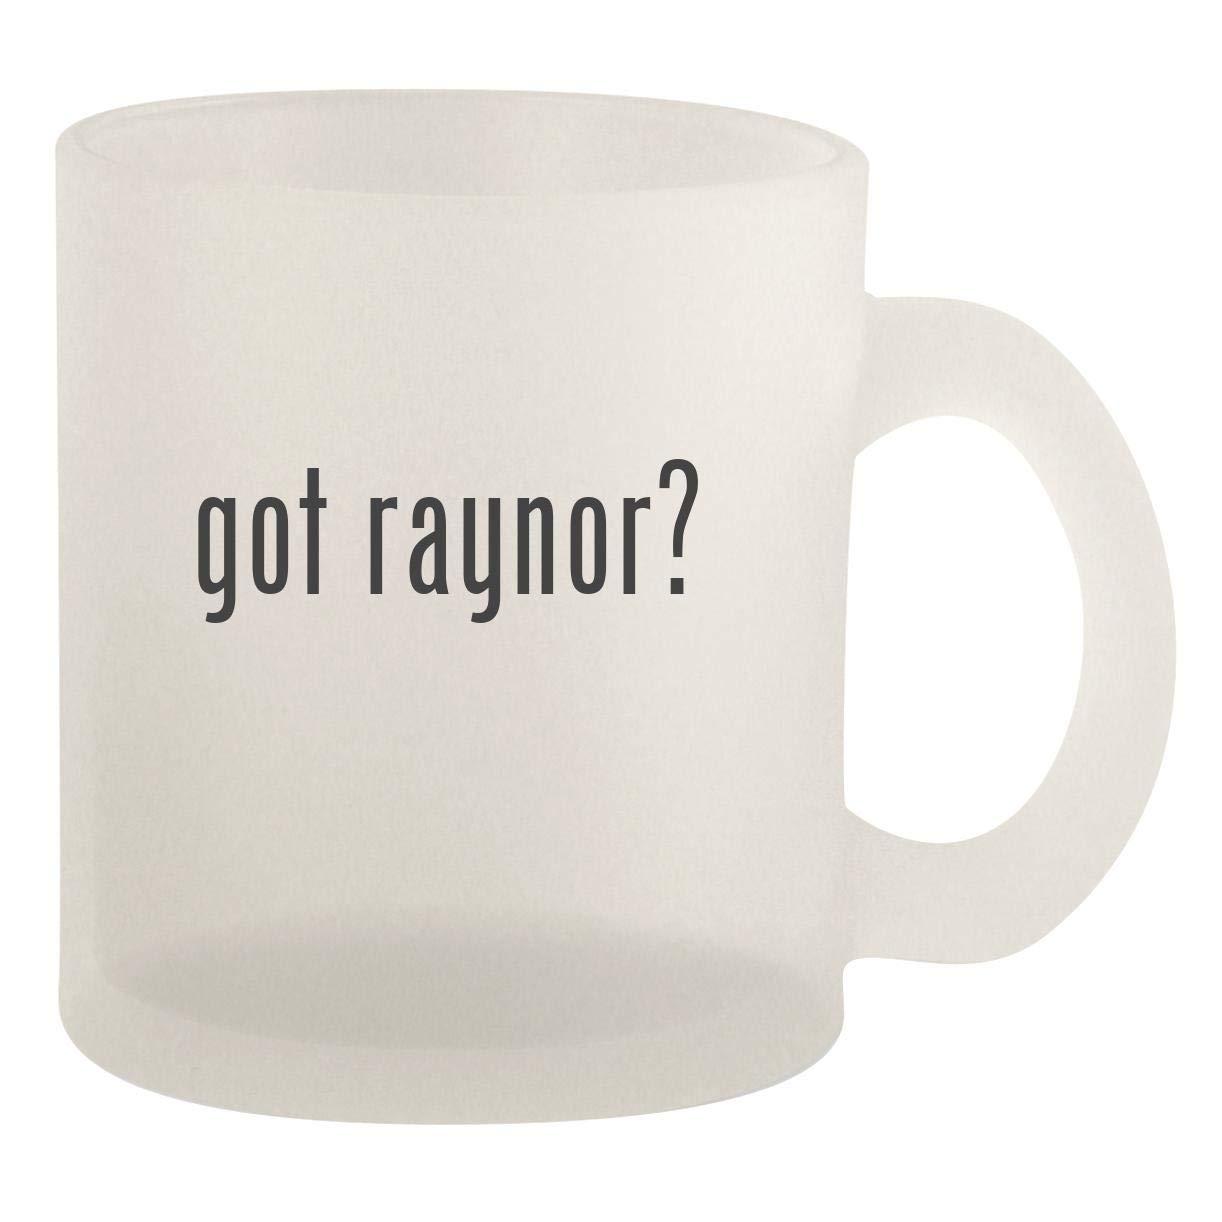 got raynor? - Glass 10oz Frosted Coffee Mug